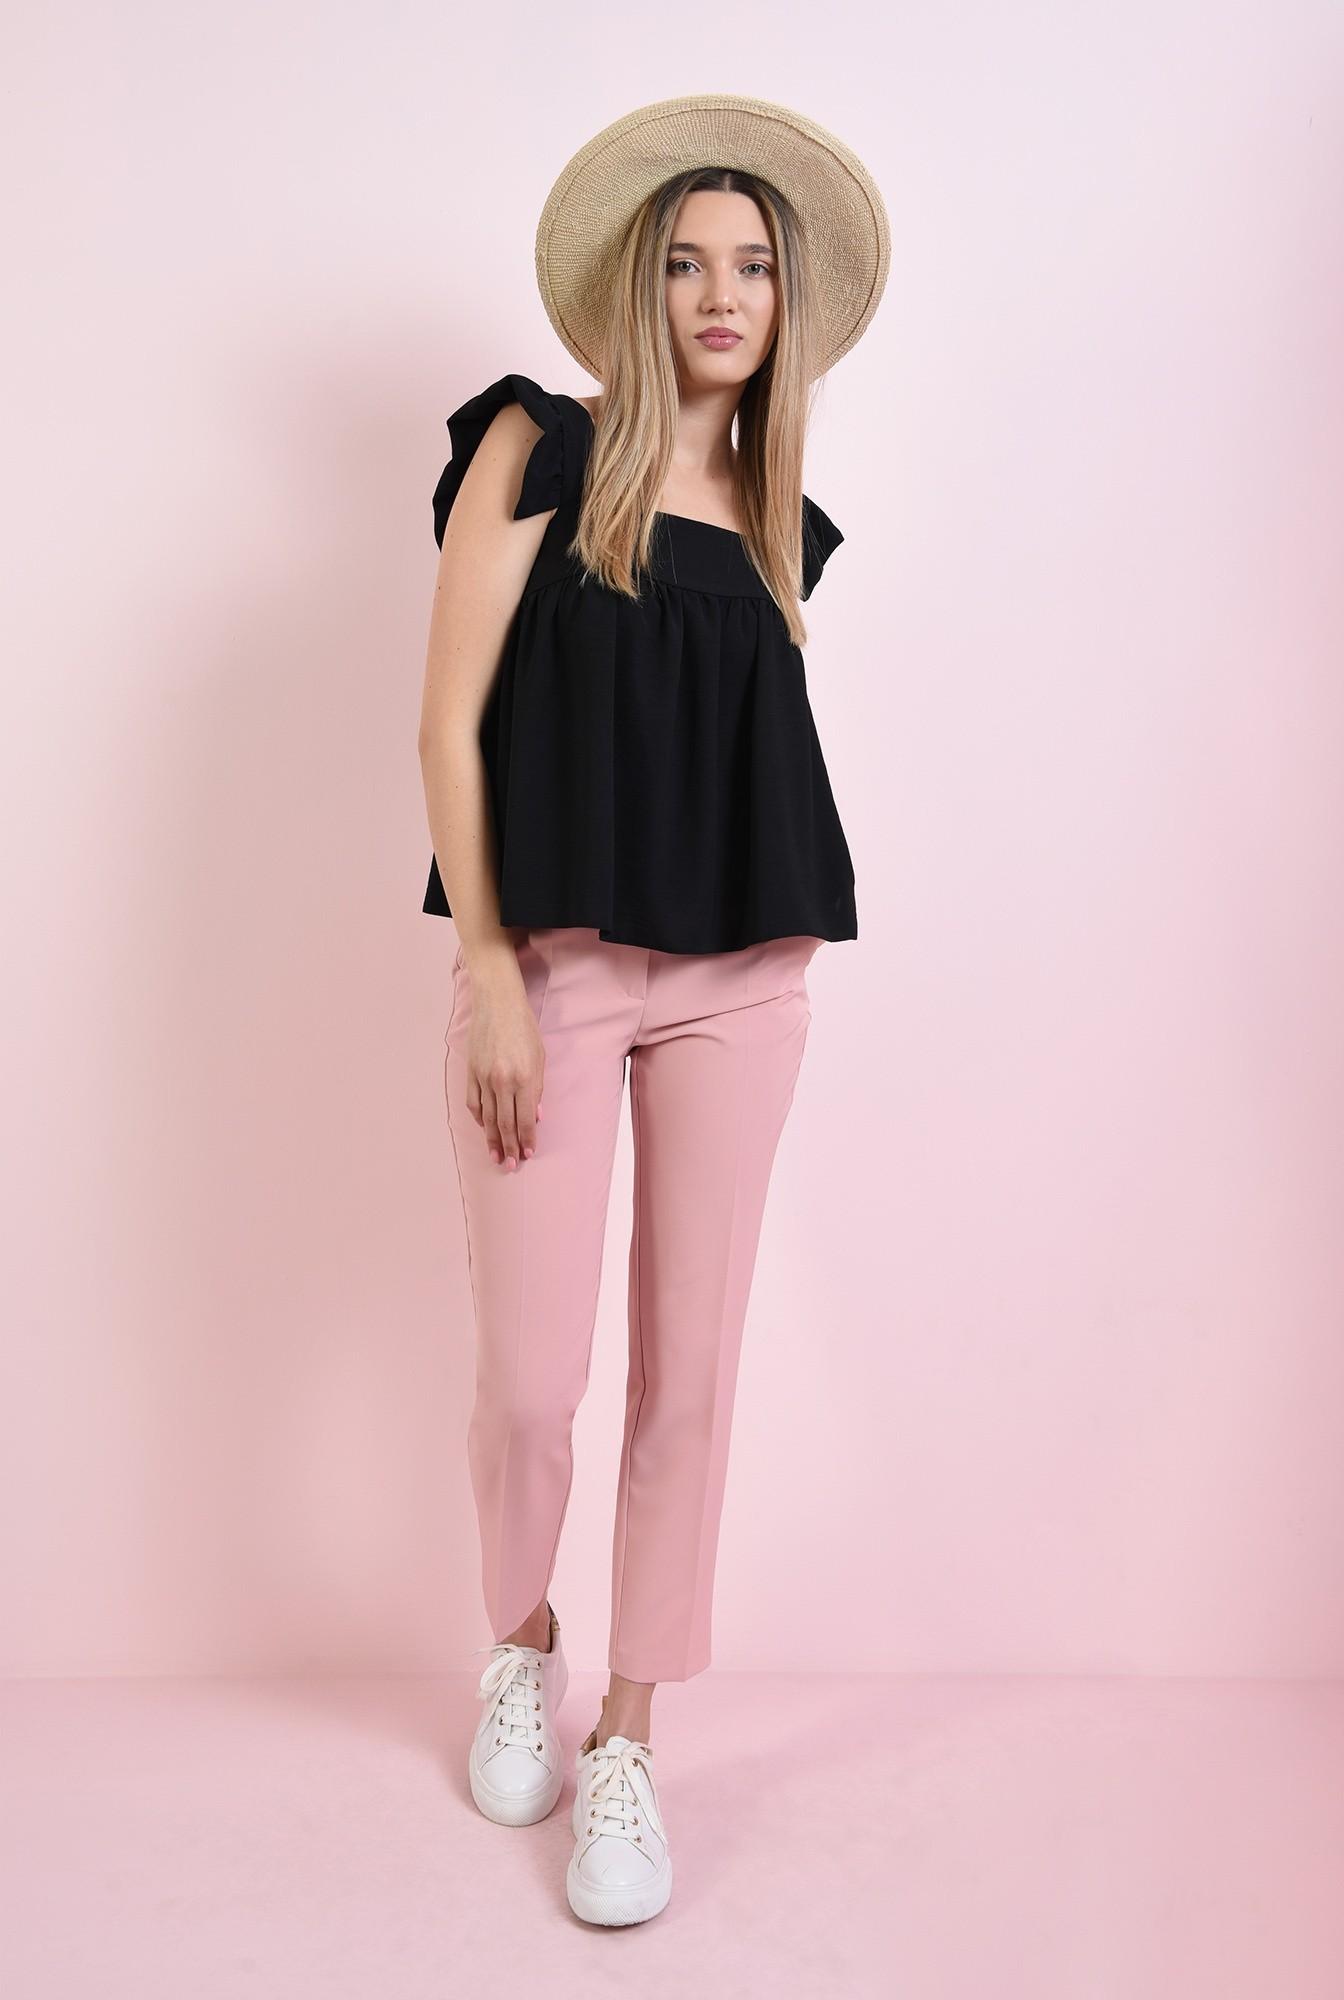 0 - pantaloni casual, roz, cu buzunar decorativ